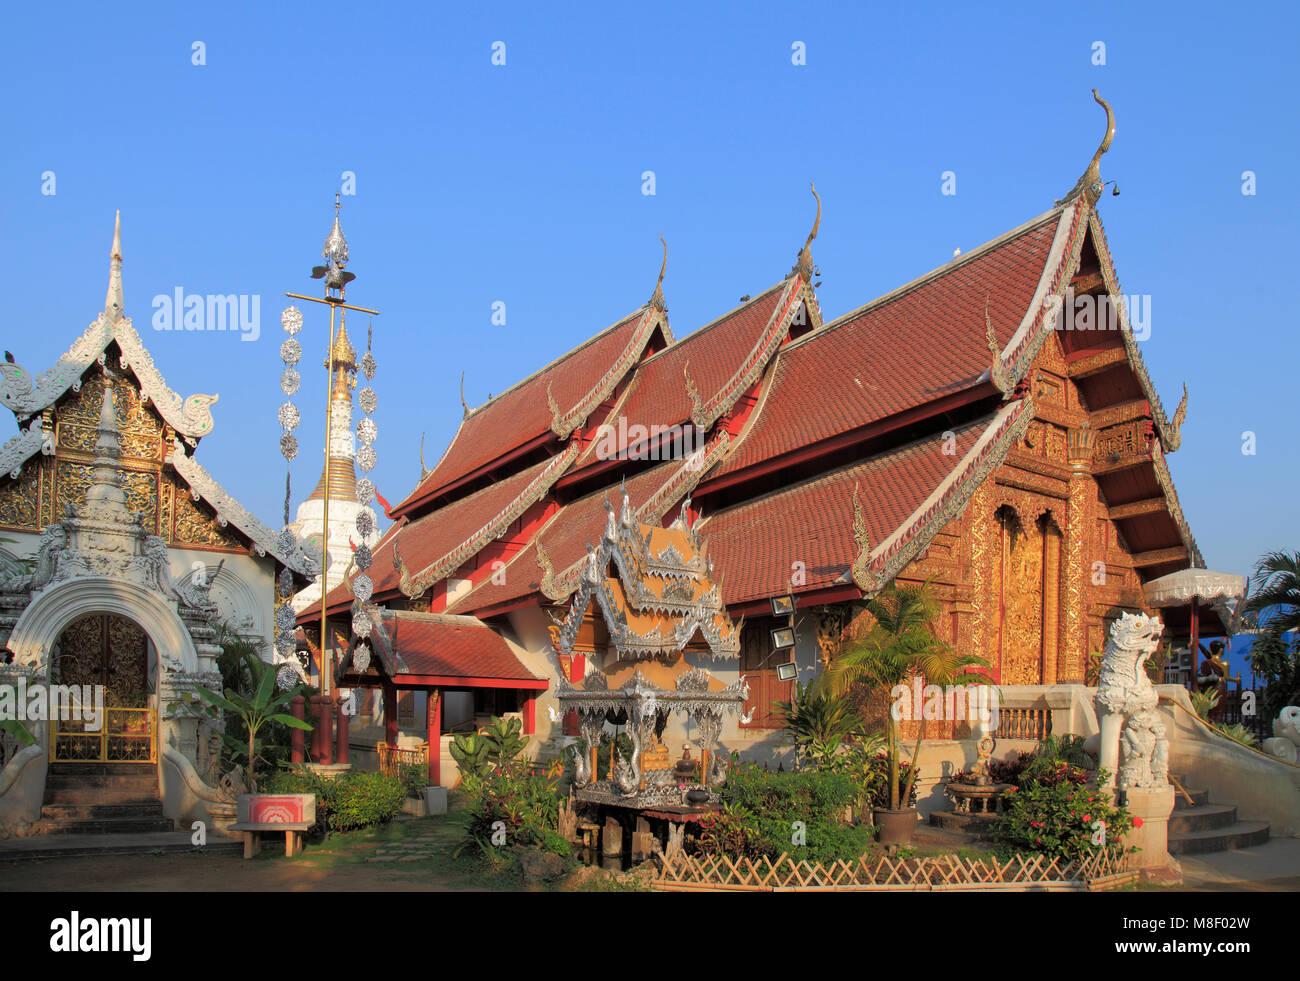 La Thaïlande, Chiang Mai, le Wat Mahawan, temple bouddhiste, Photo Stock